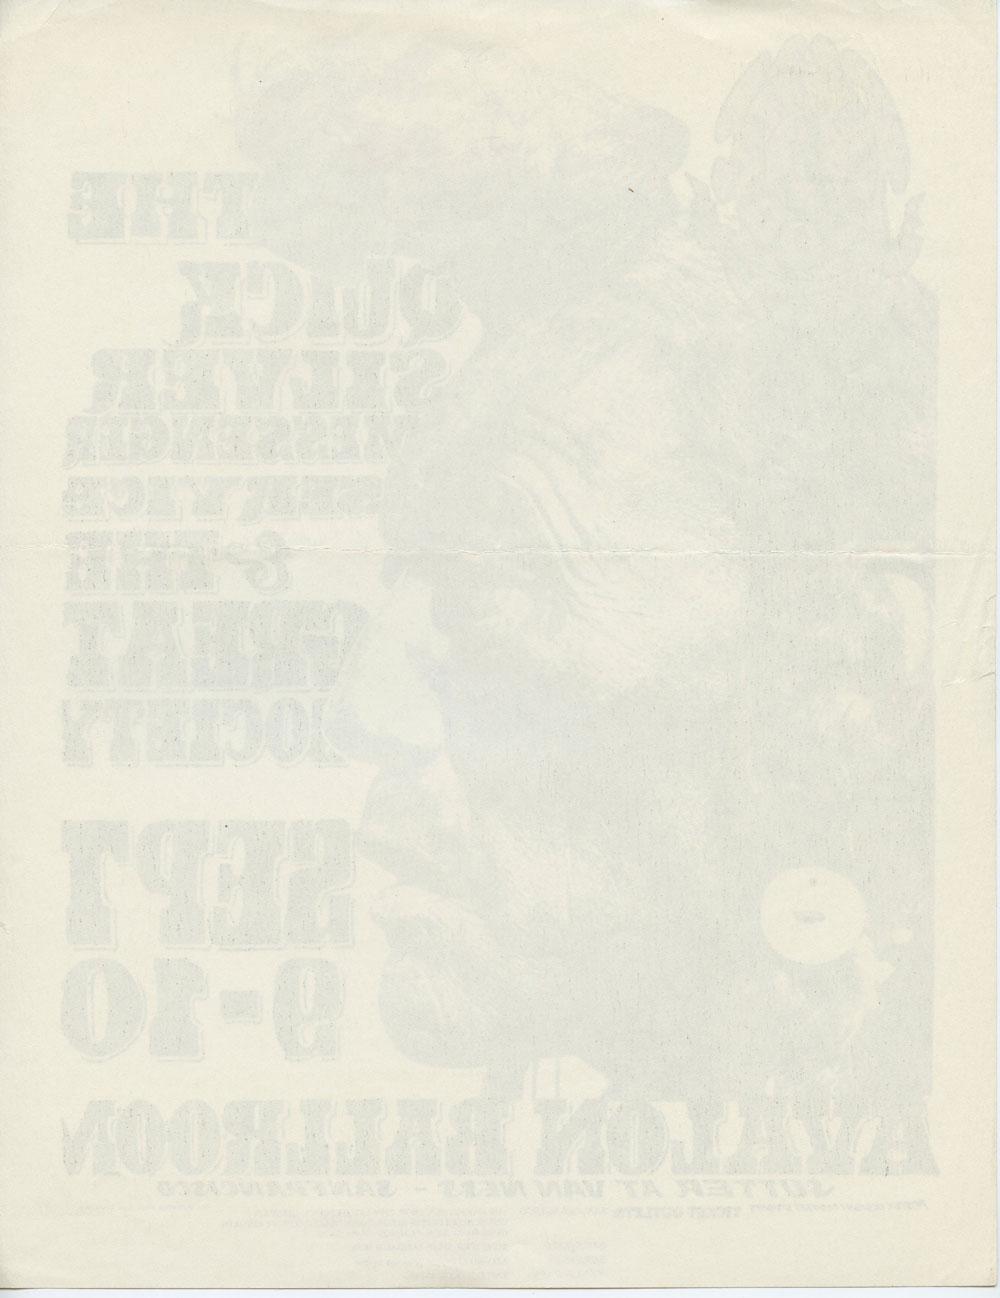 Family Dog  25 Handbill  1966 Sep 9 Indian Quicksilver Messenger Service